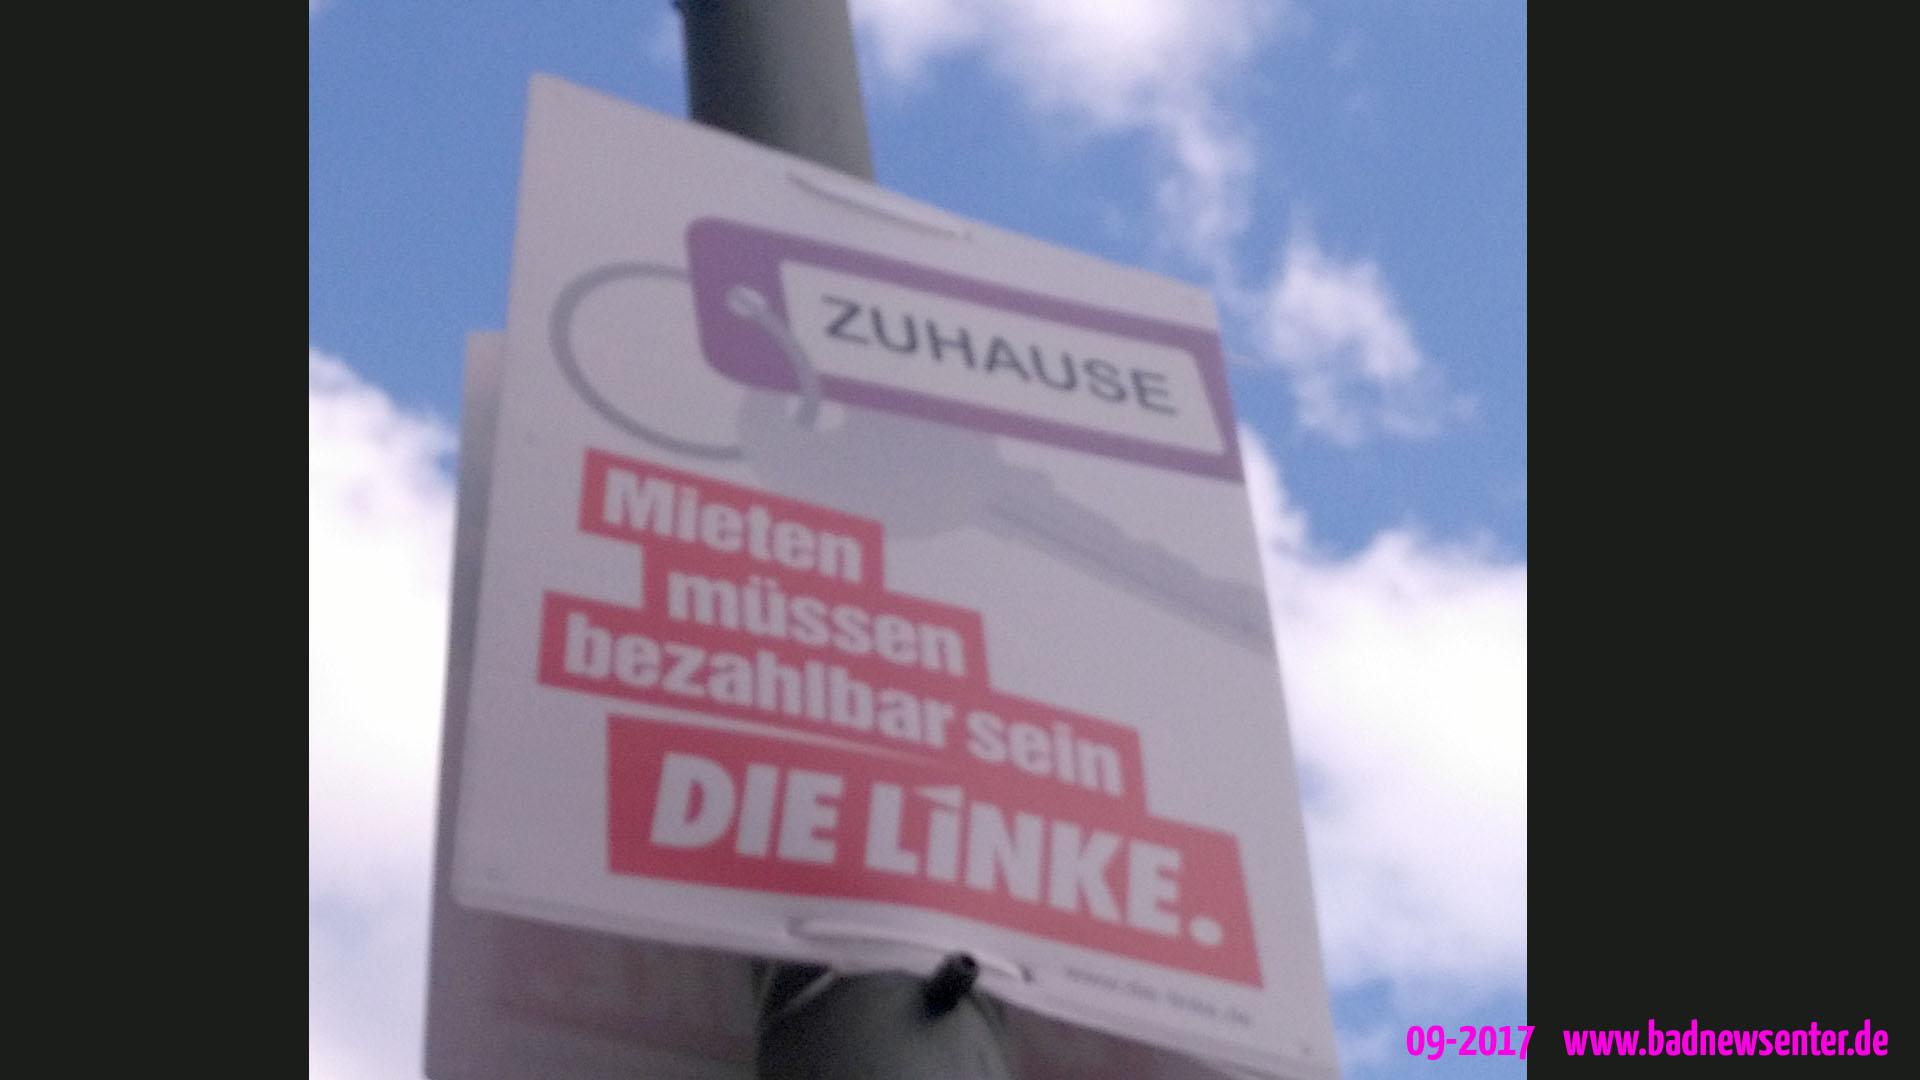 BNE-09-2017-Wahlkampf-004